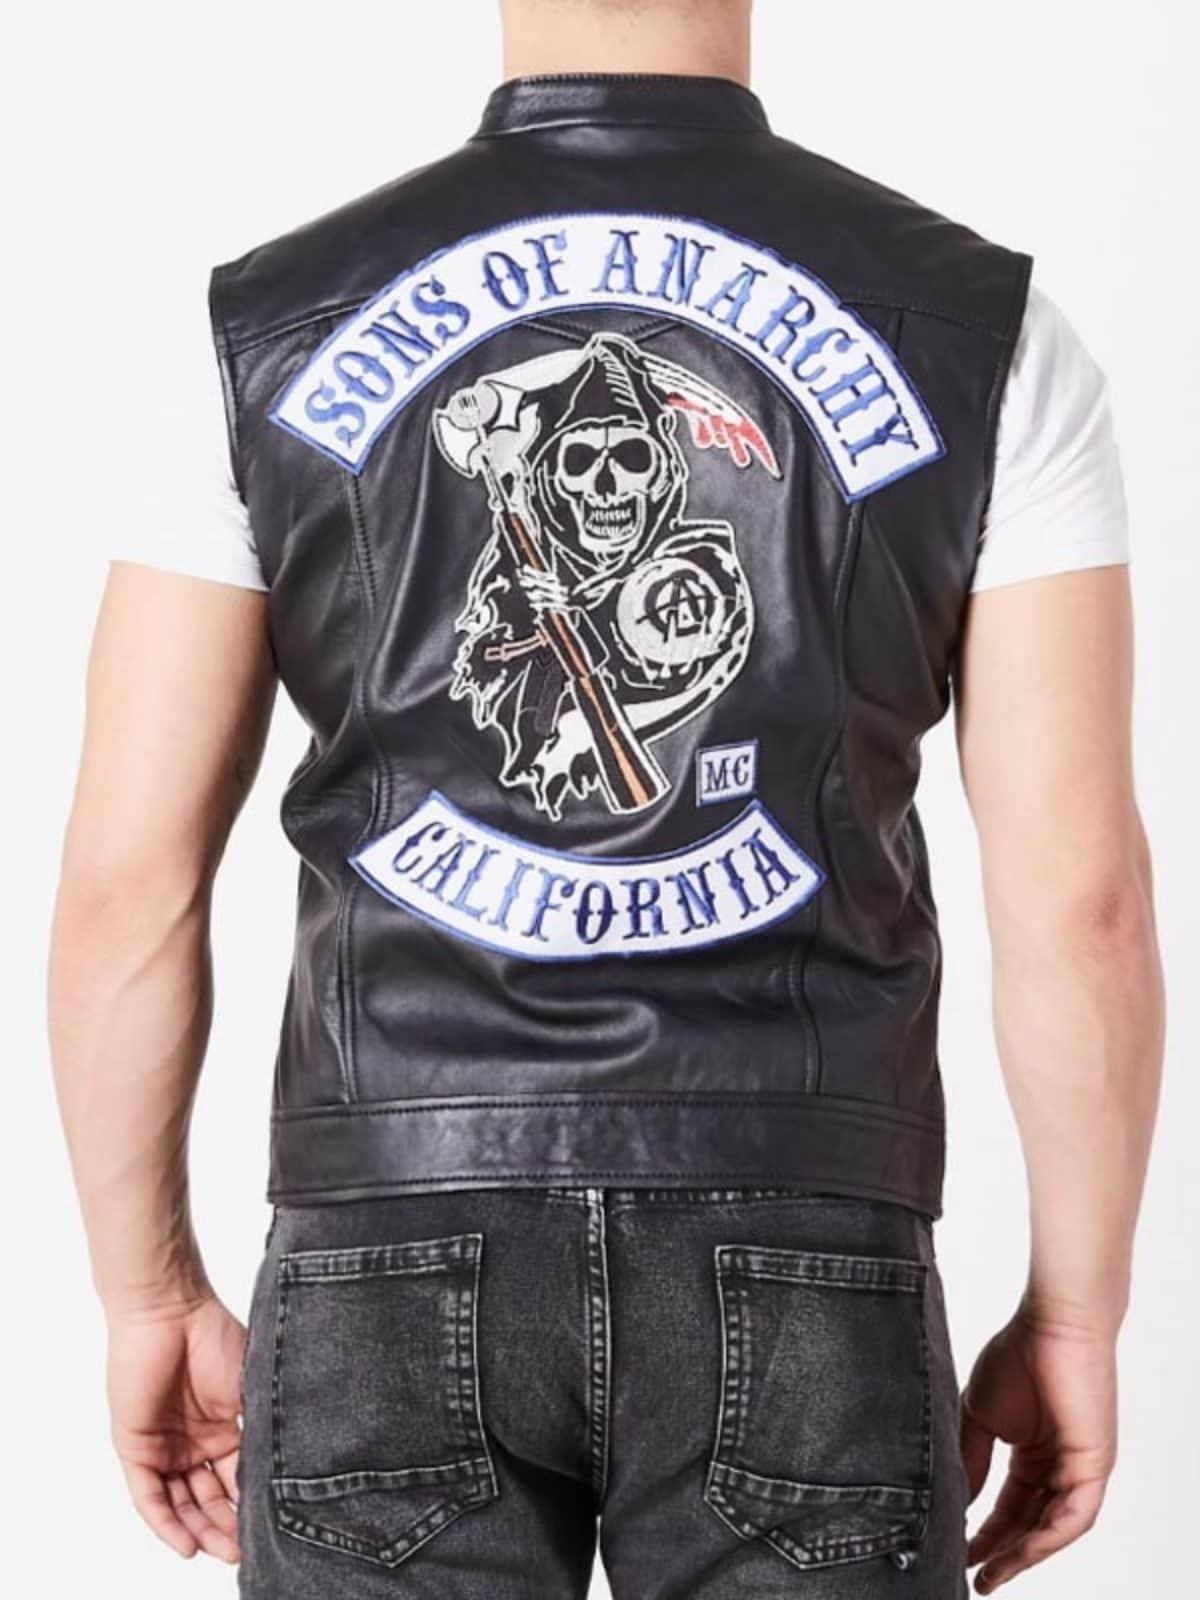 Jax Teller Charlie Hunnam Soa Sons Of Anarchy Leather Vest